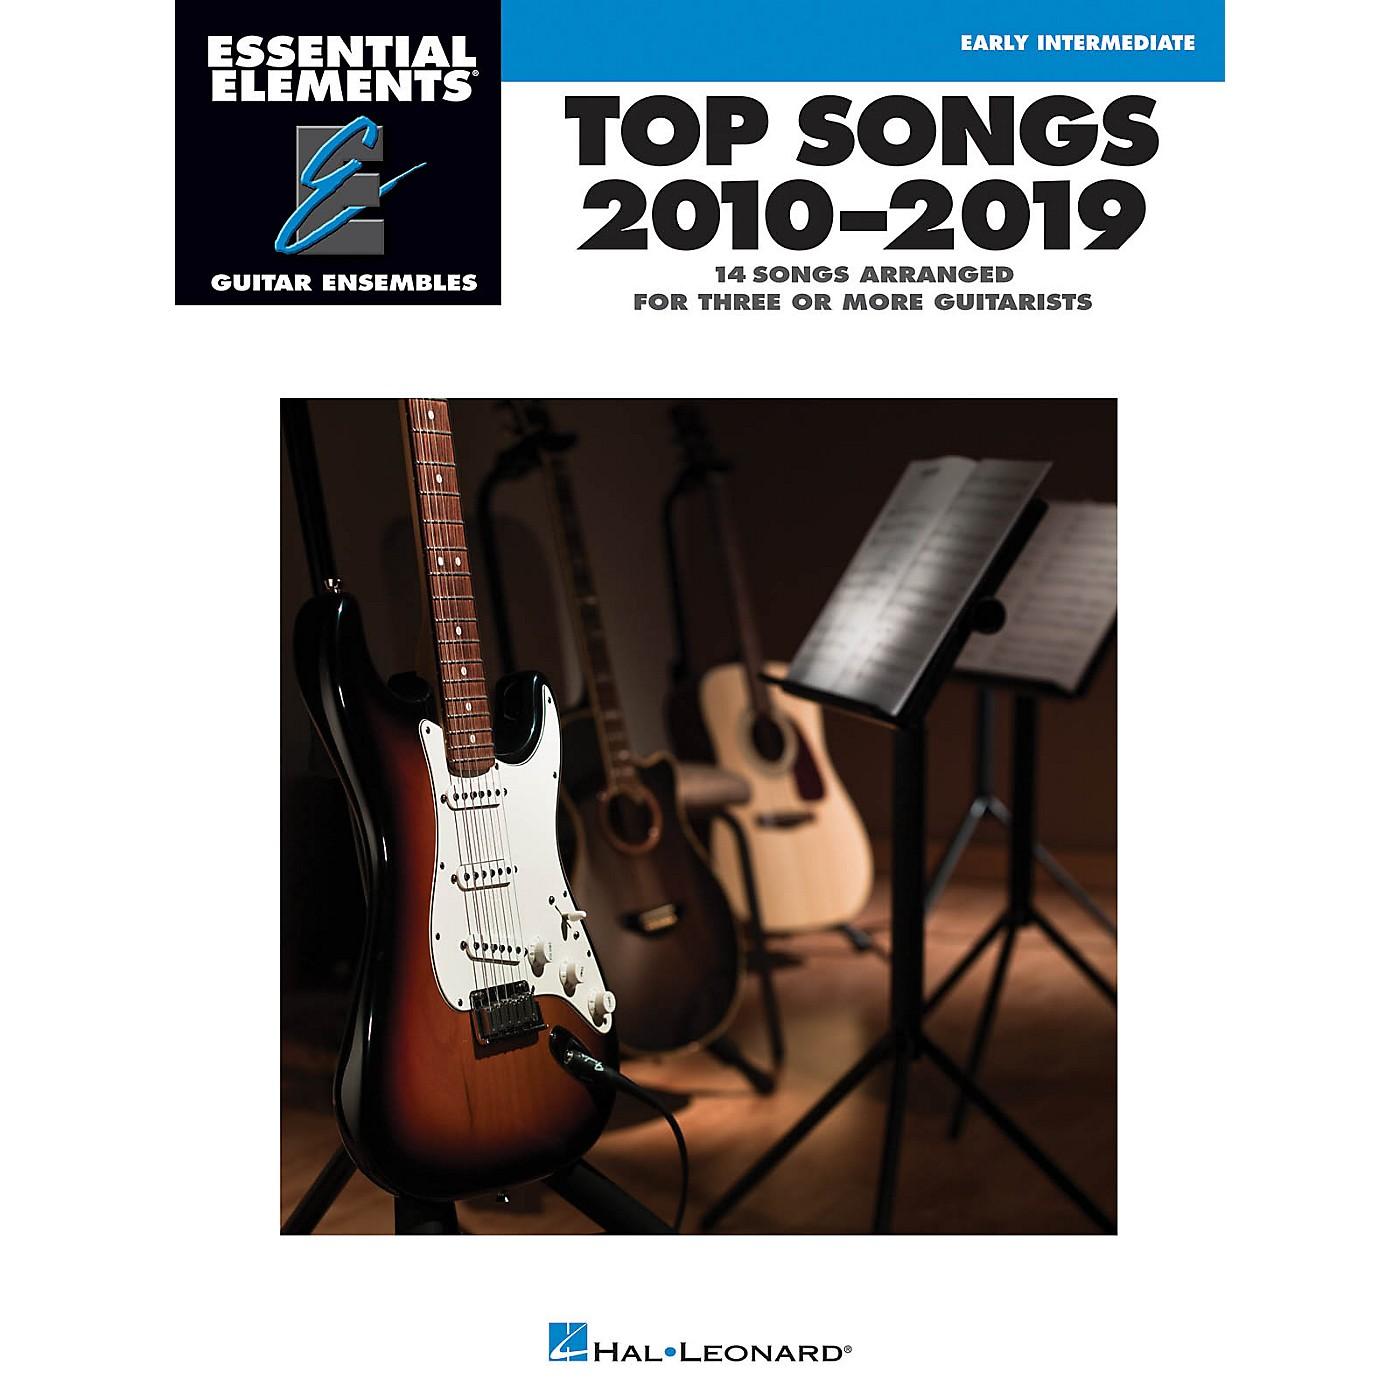 Hal Leonard Top Songs 2010-2019 Essential Elements Guitar Ensembles Early Intermediate Level thumbnail